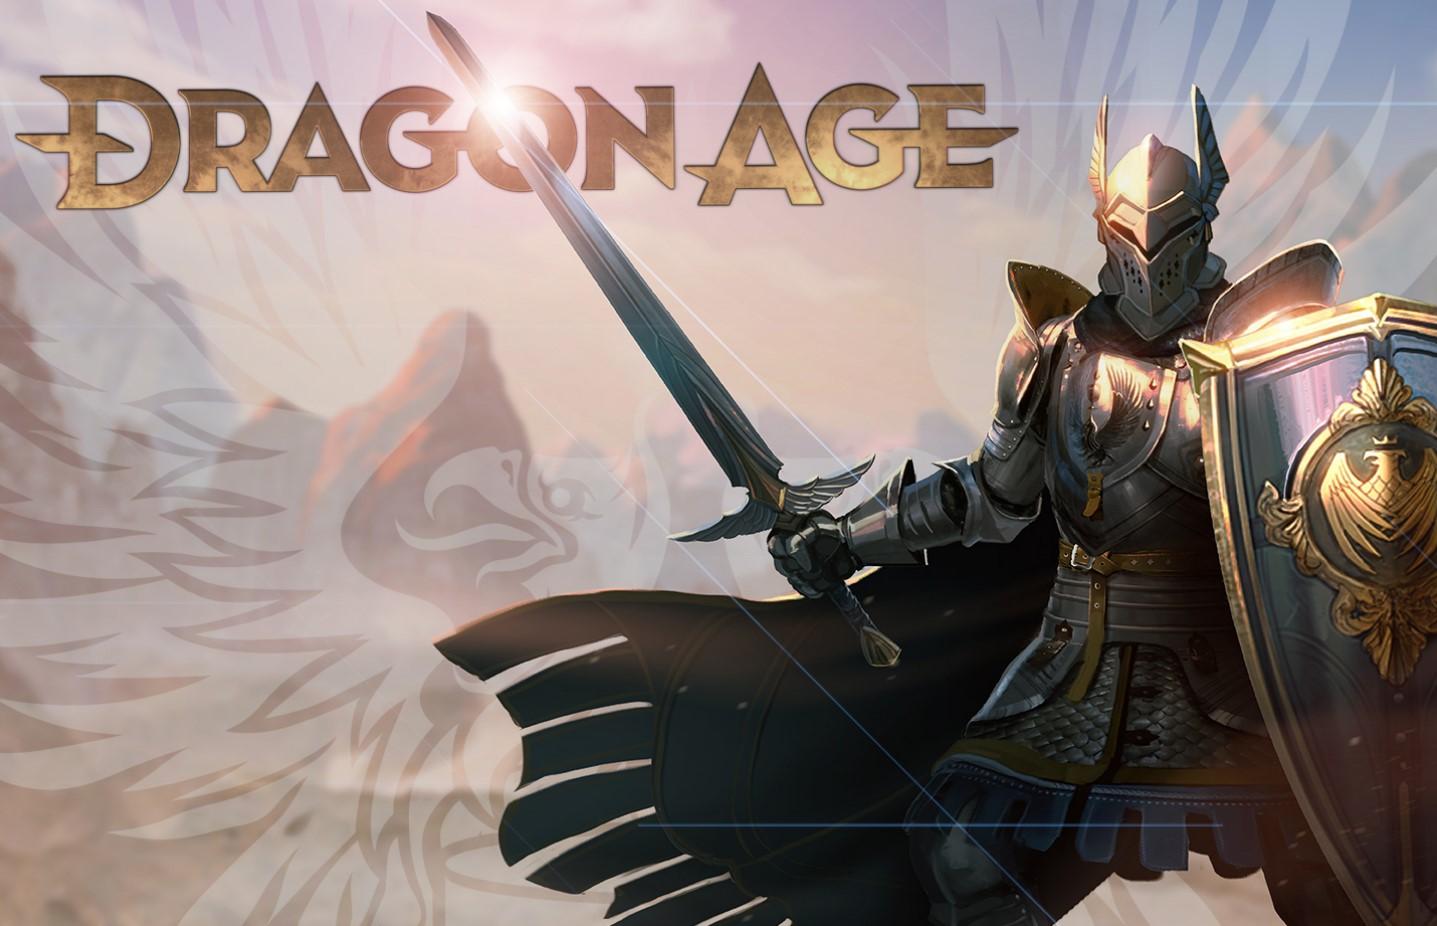 Dragon Age 4 concept art